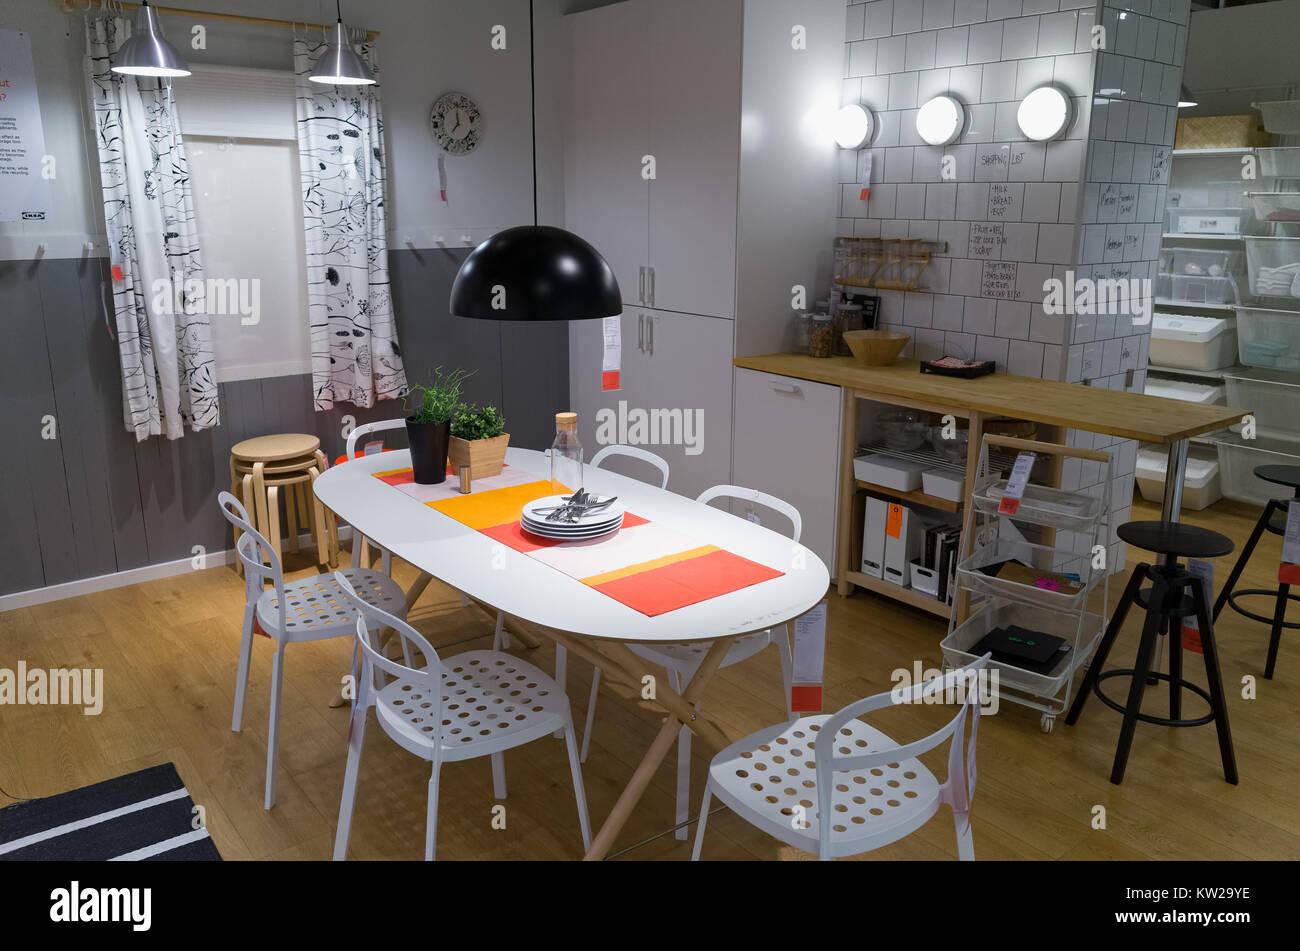 Ikea Showroom Stockfotos & Ikea Showroom Bilder - Alamy